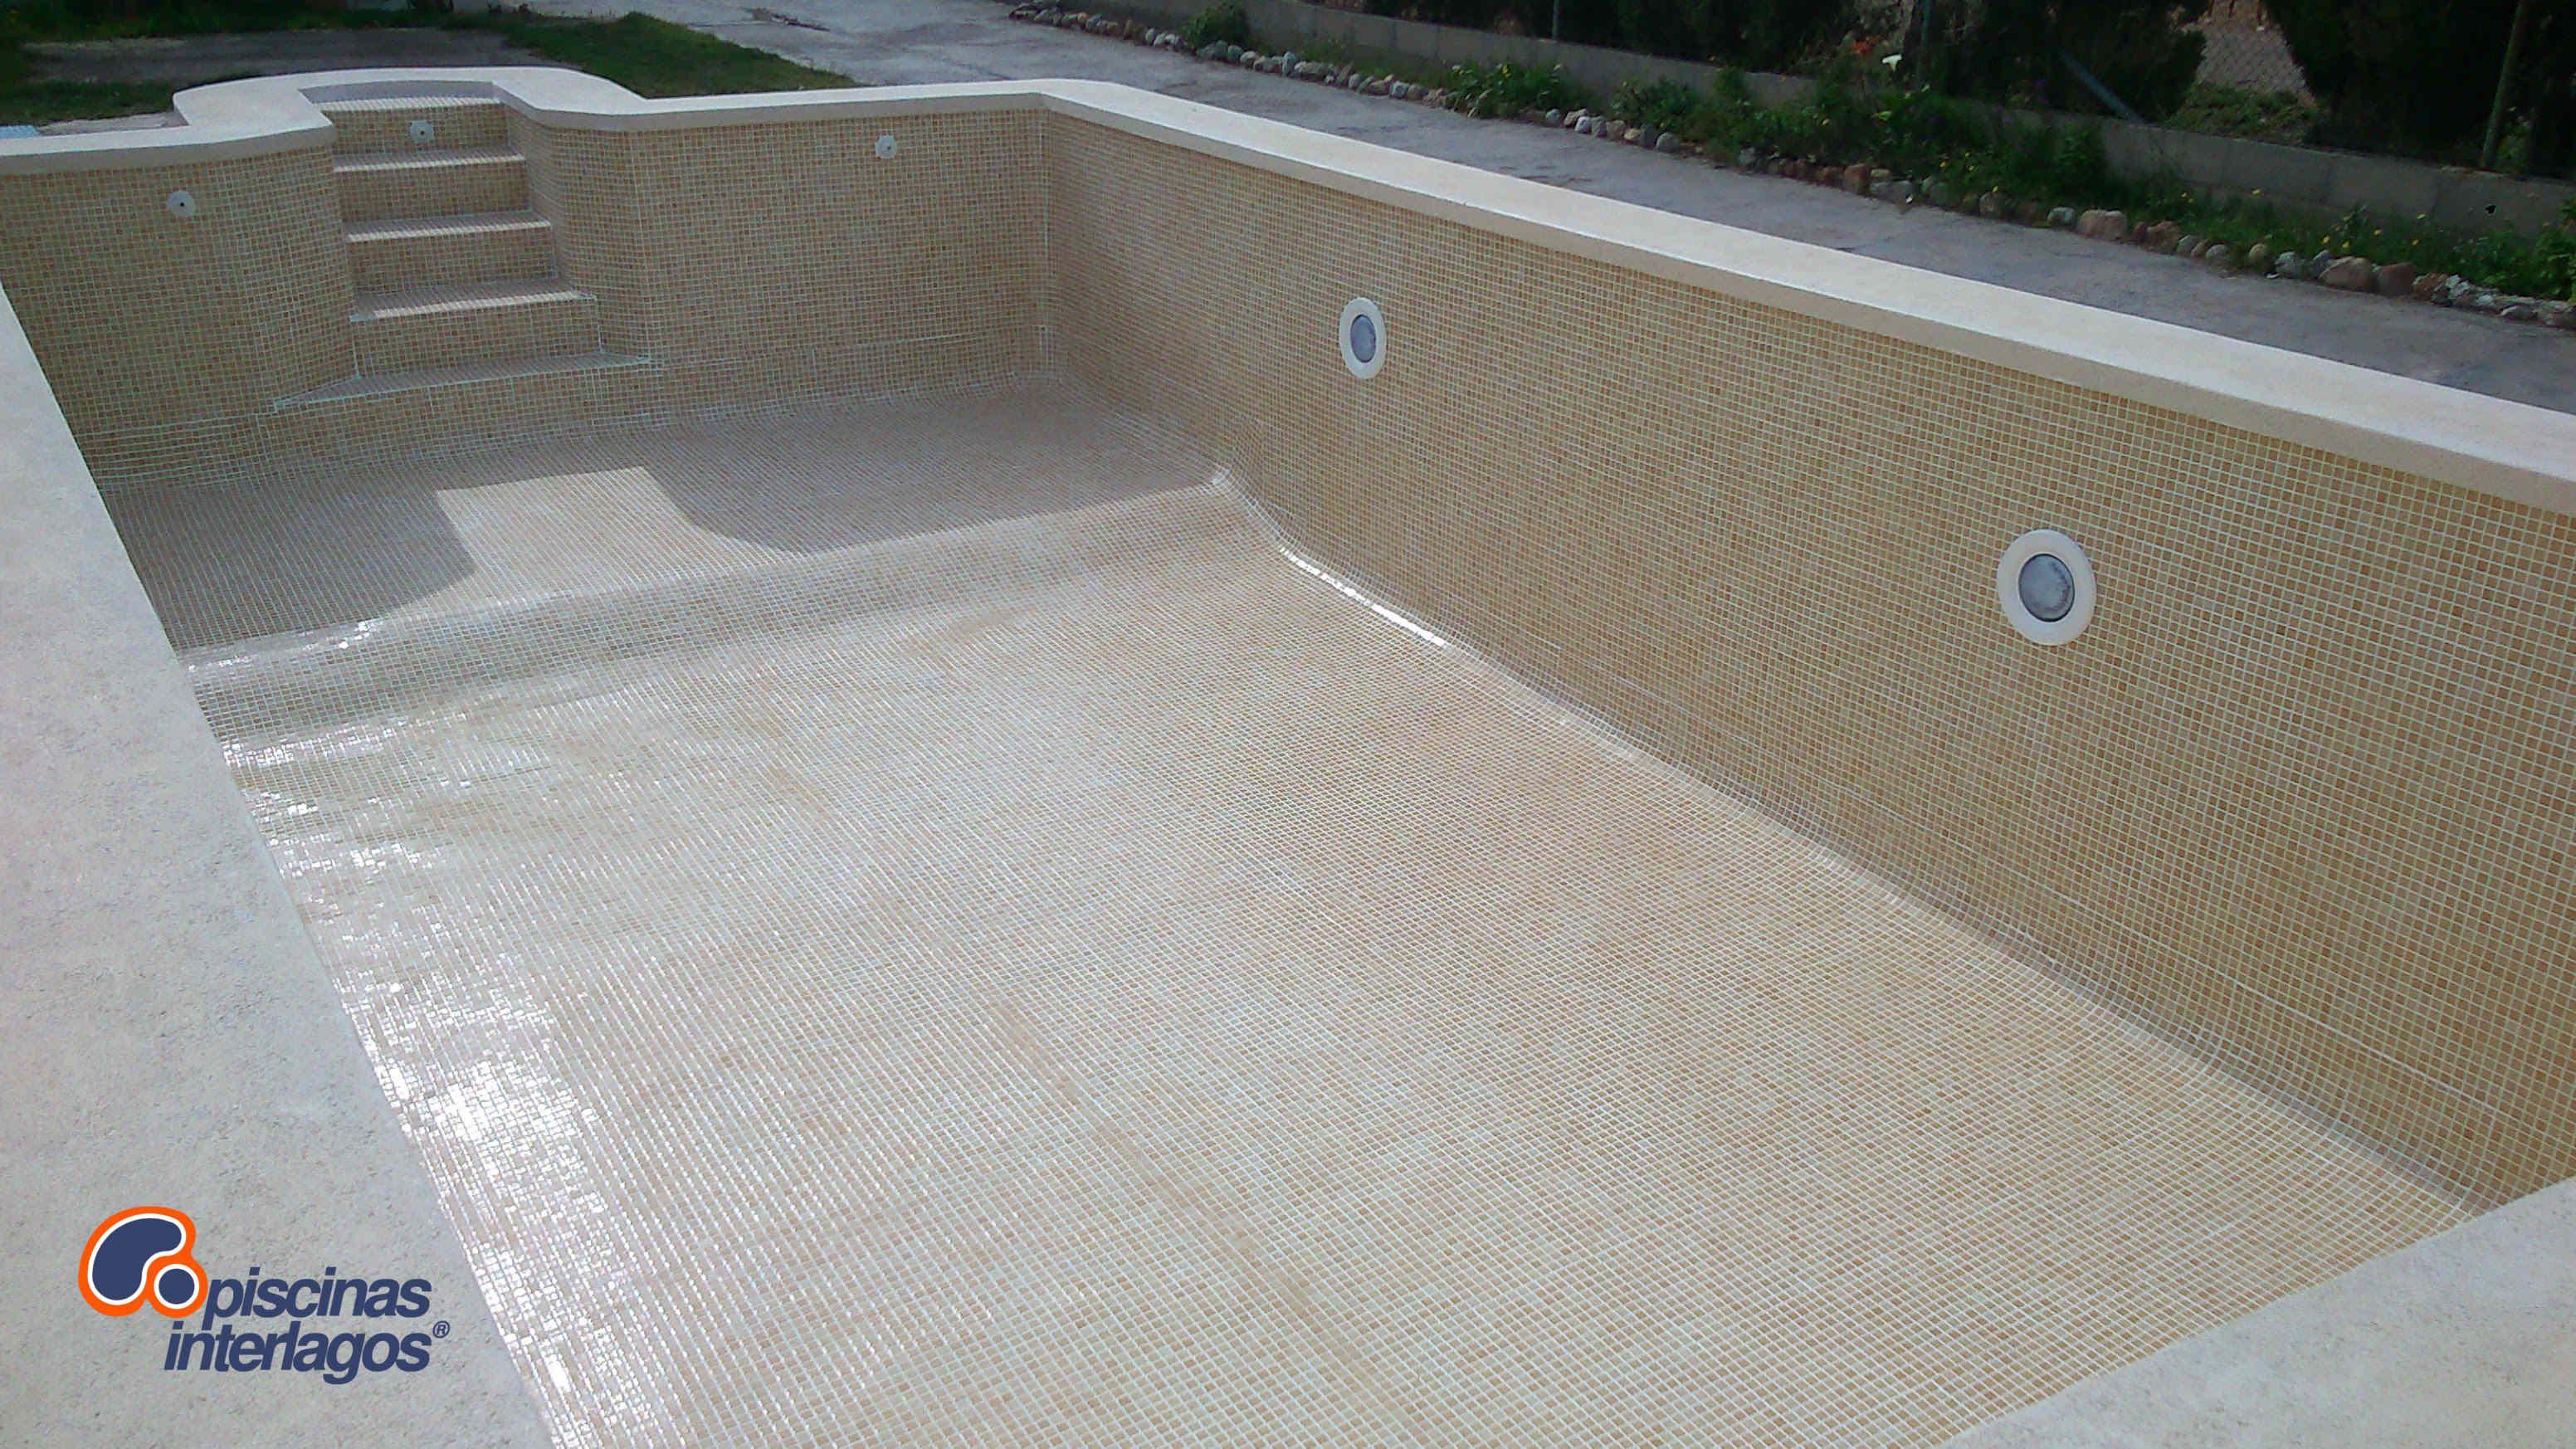 Piscina rehabilitada con gresite color arena grao de - Gresite piscinas colores ...